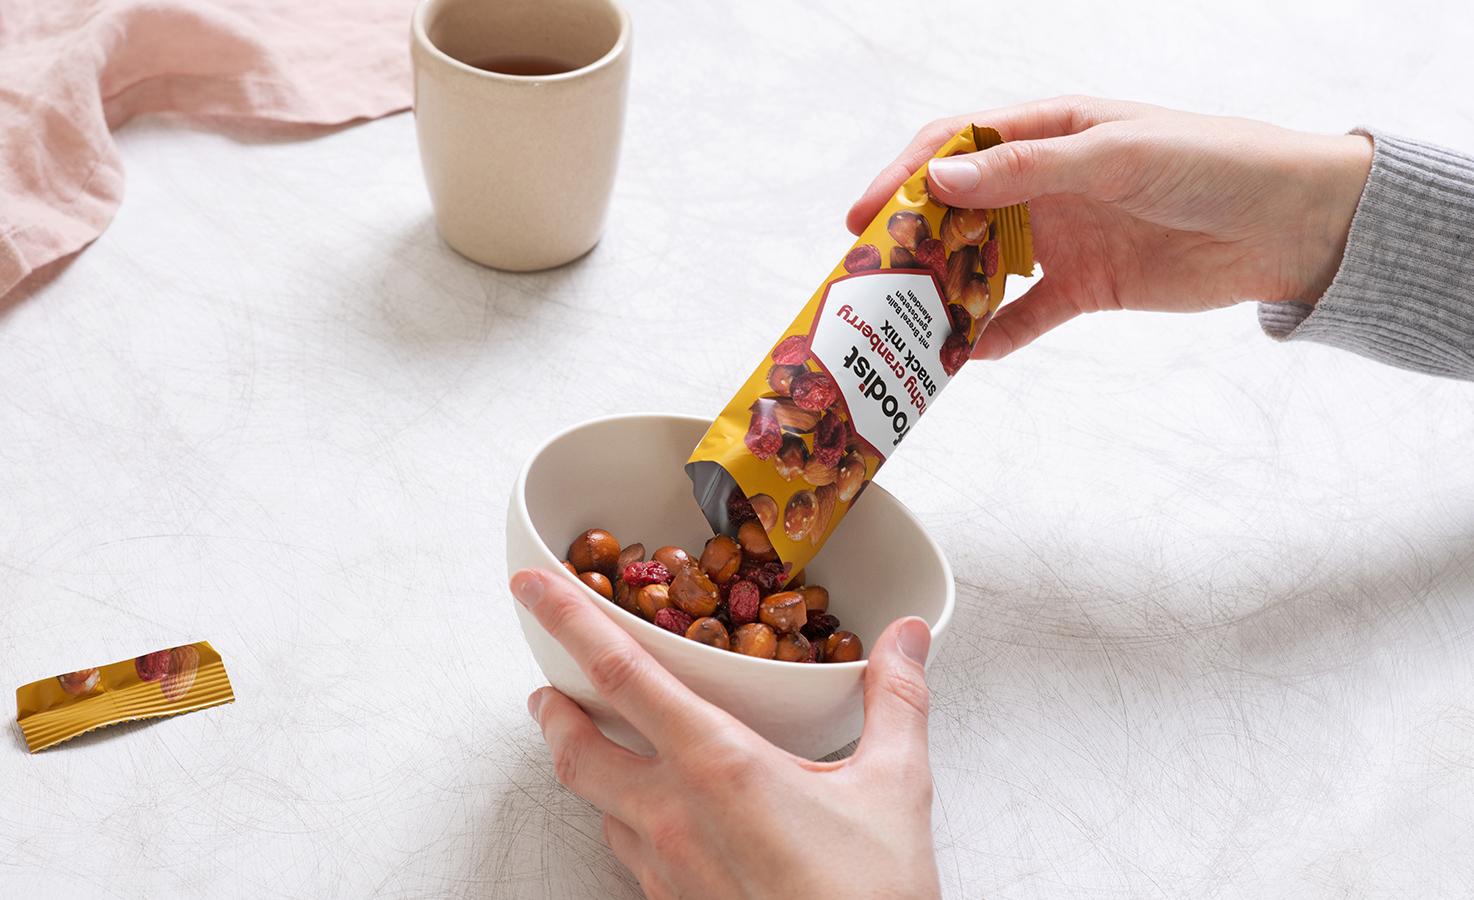 Crunchy Cranberry Snack Mix